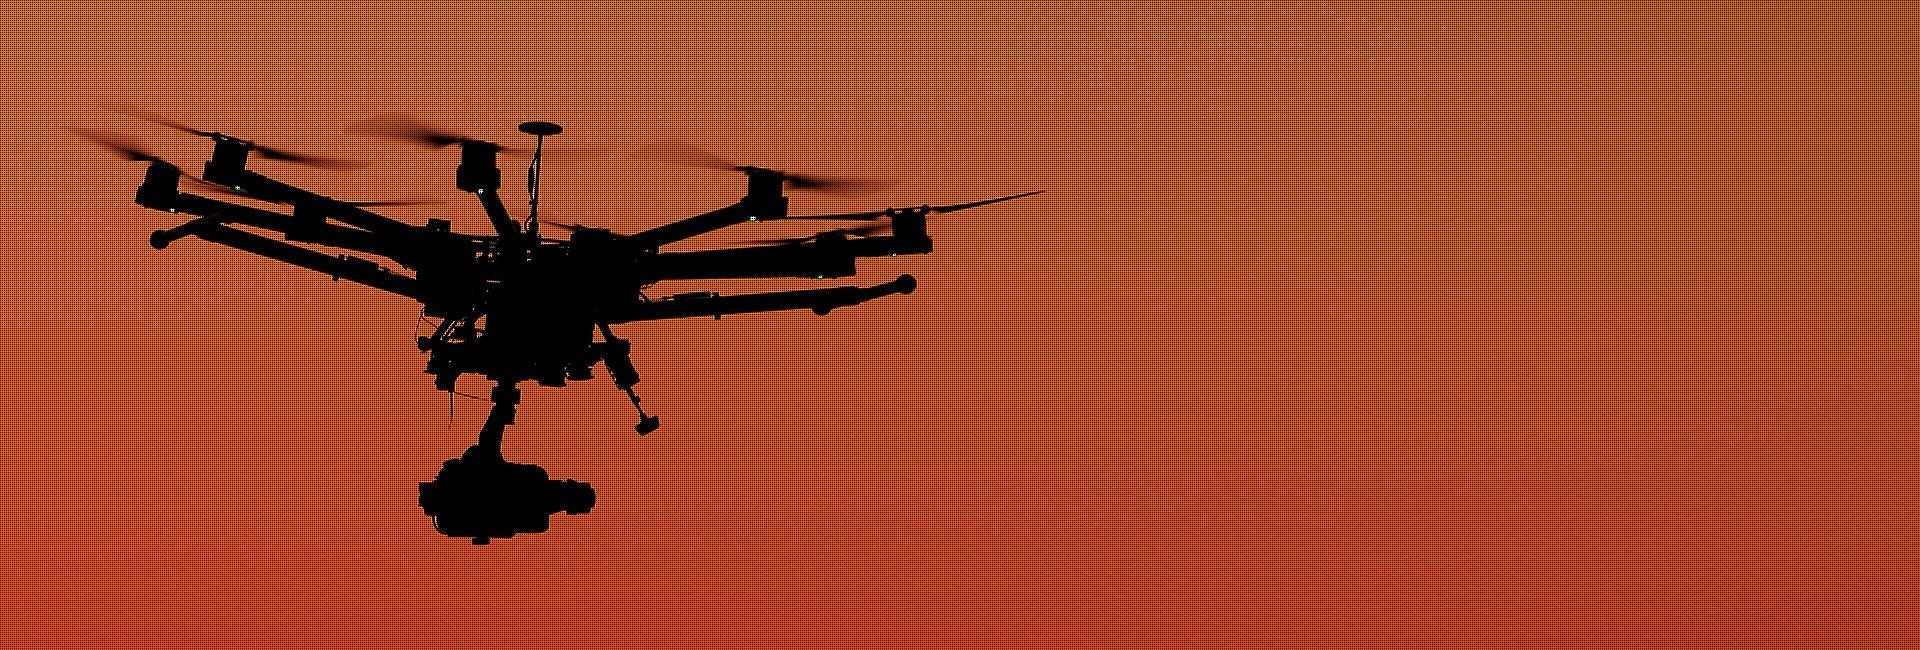 slide-drones-04